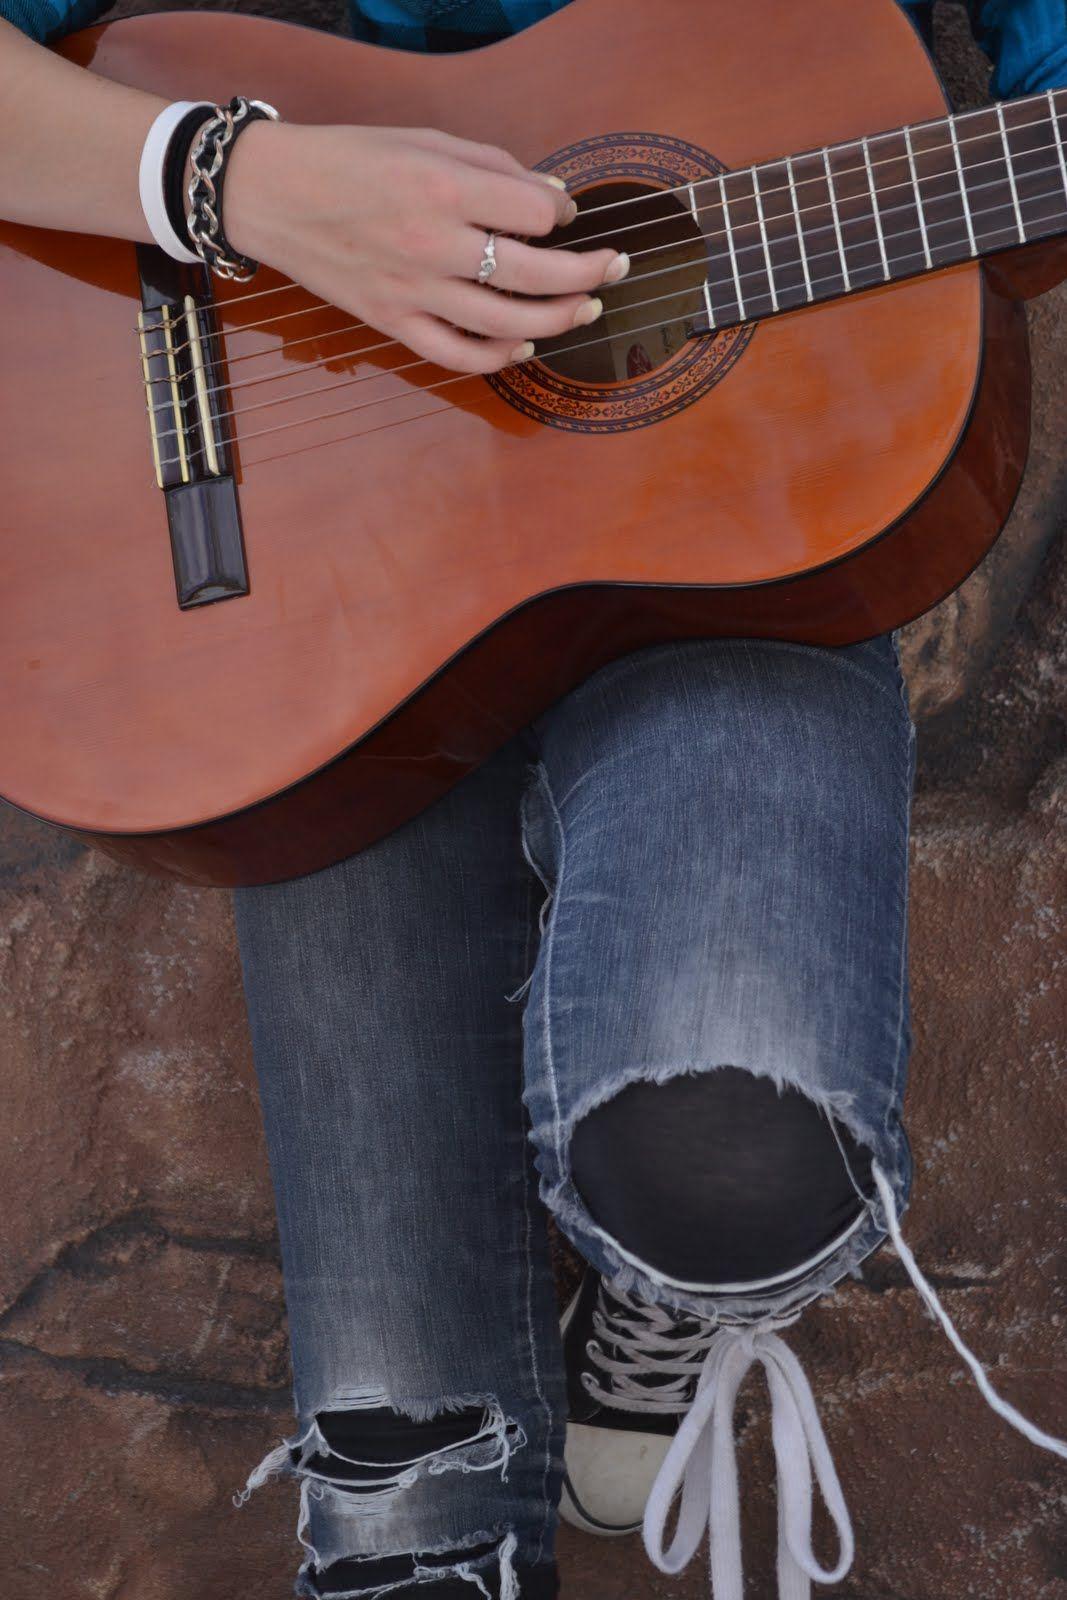 guitar pose guitars and sometimes guitar players too pinterest. Black Bedroom Furniture Sets. Home Design Ideas